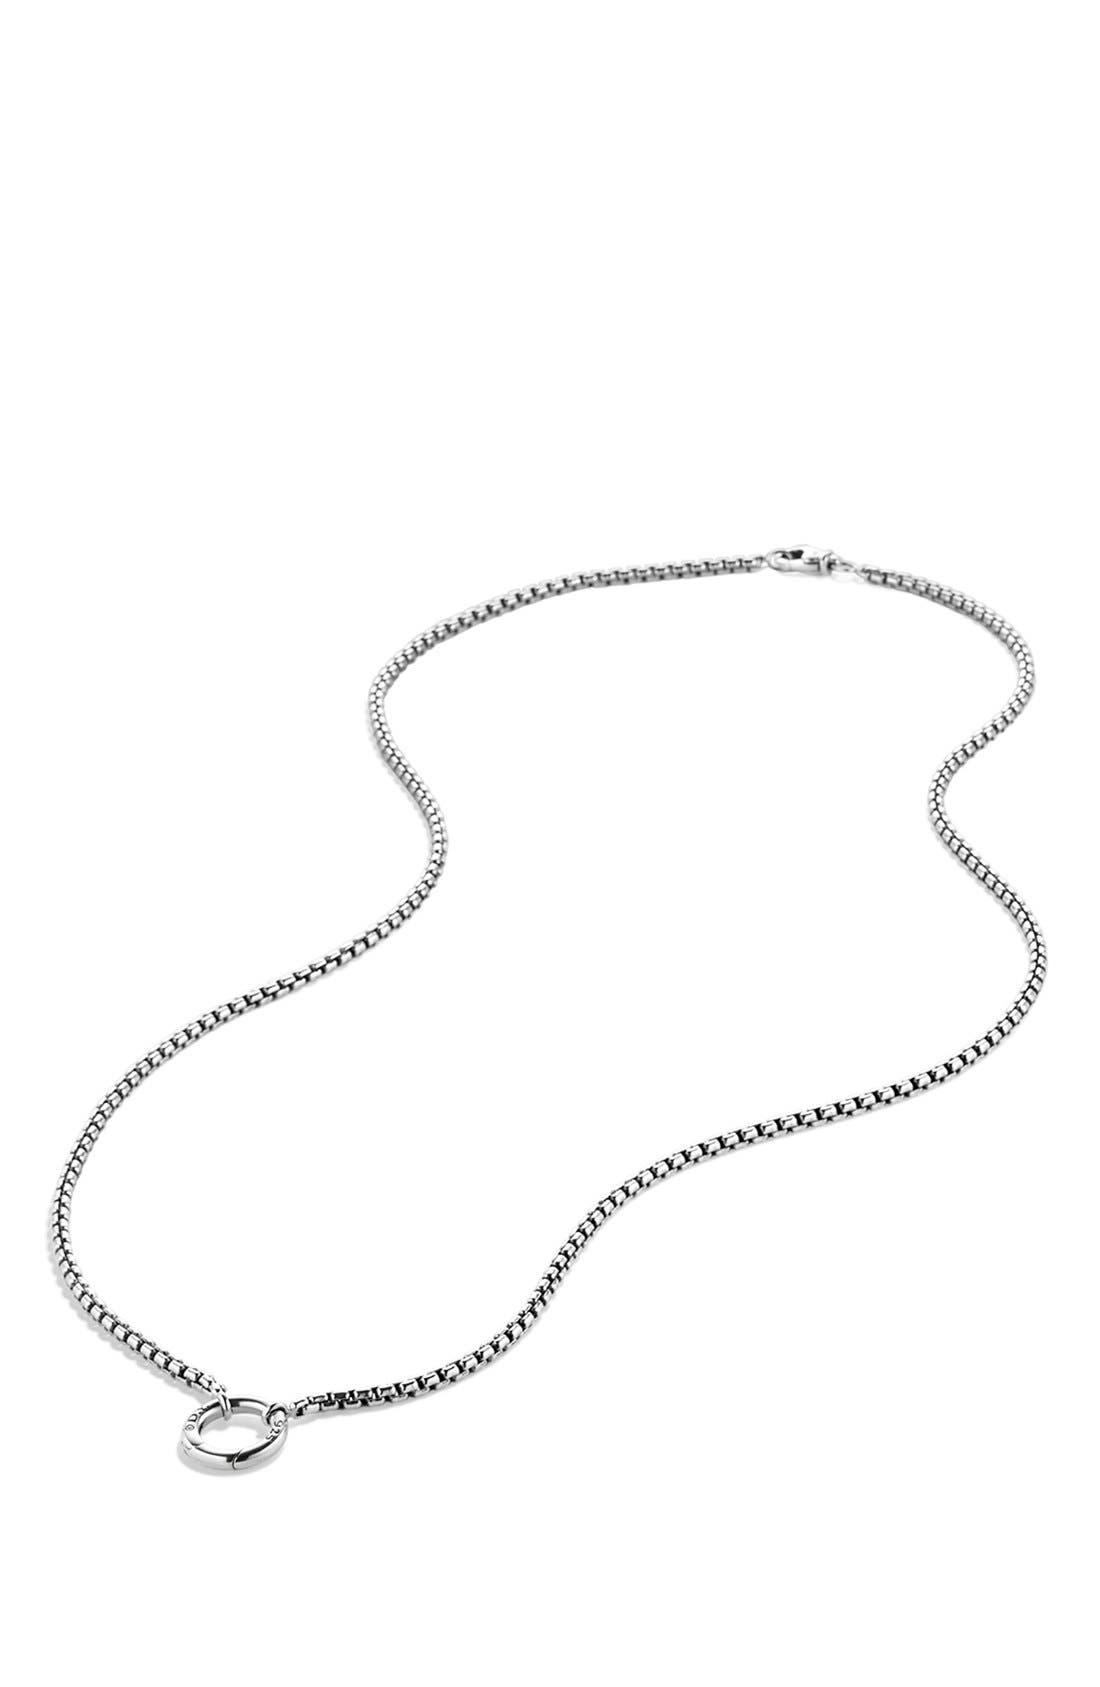 Alternate Image 2  - David Yurman 'Chain' Charm Chain Necklace